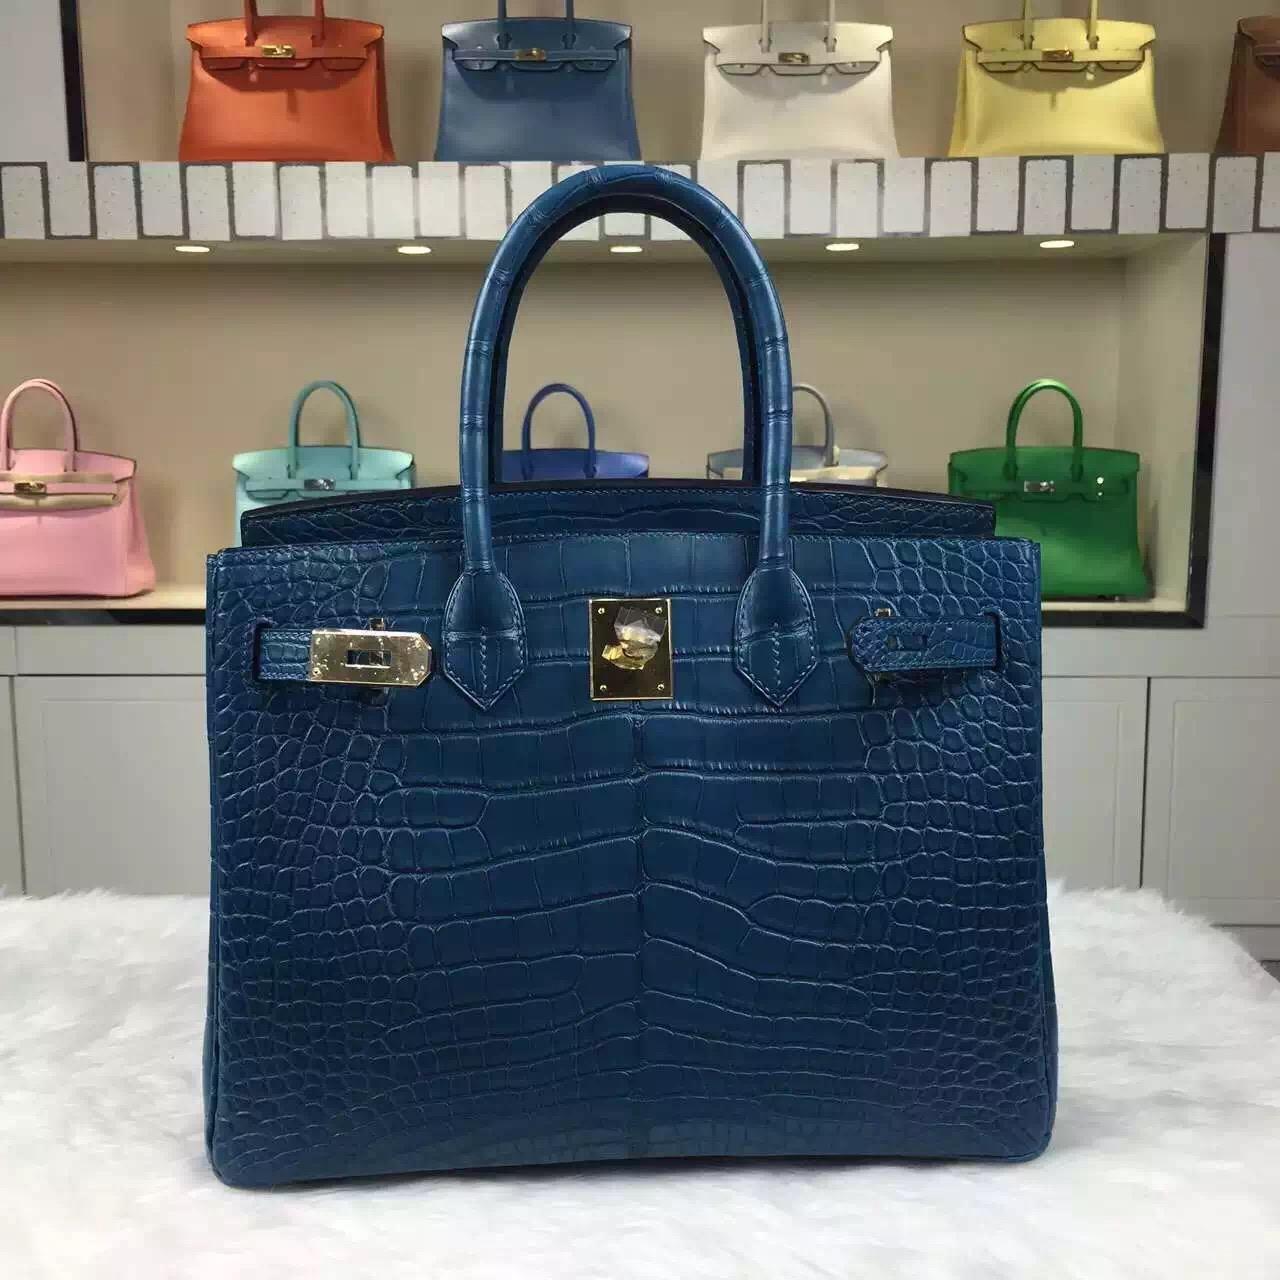 Wholesale Hermes Crocodile Matt Birkin Bag 7L Blue De Maite 30CM